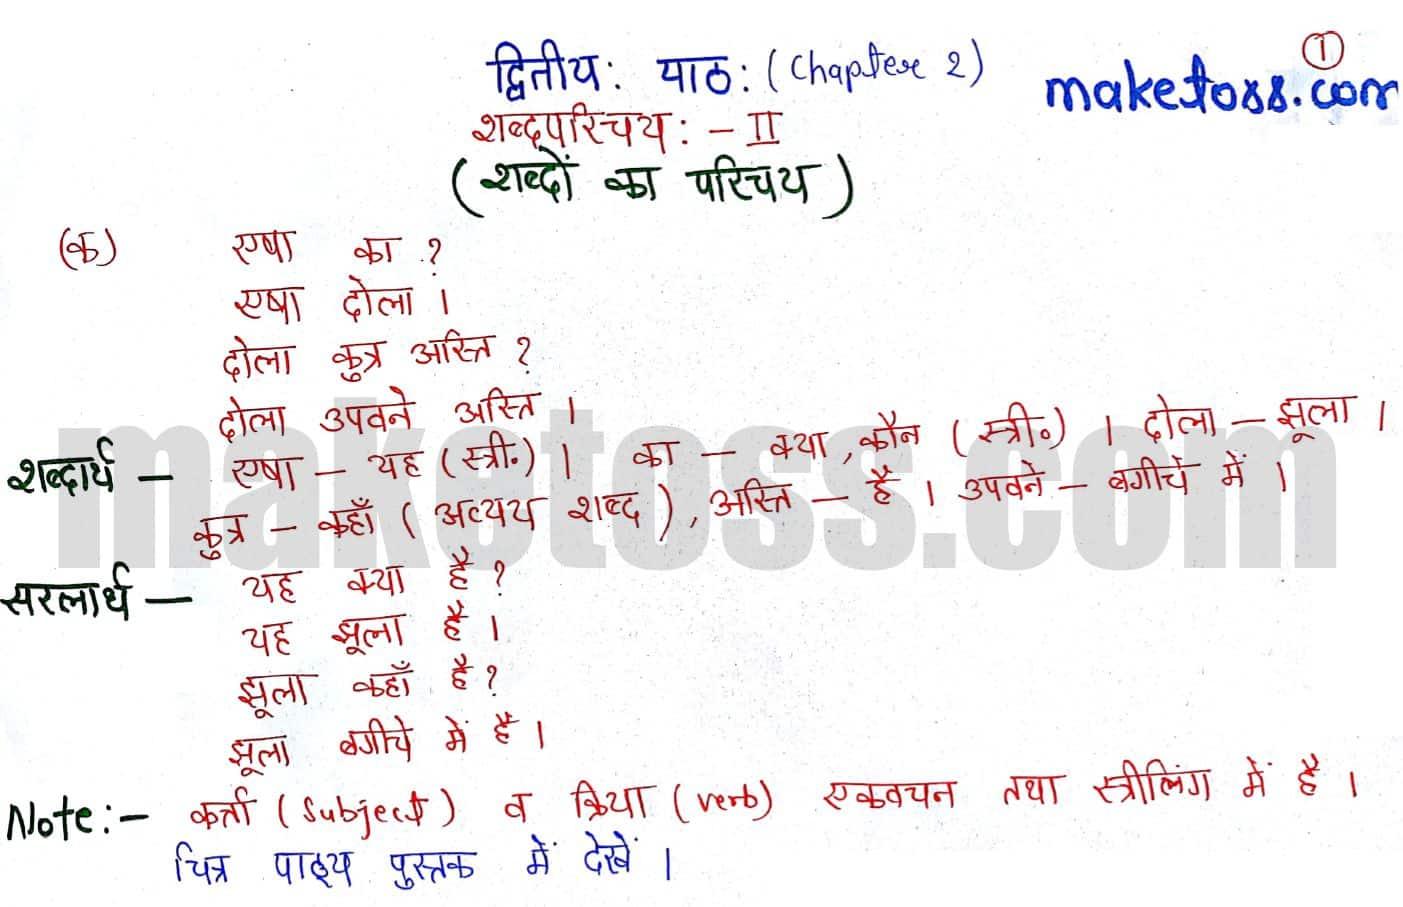 Class 6 Sanskrit chapter 2 - शब्दपरिचय 2 hindi translation